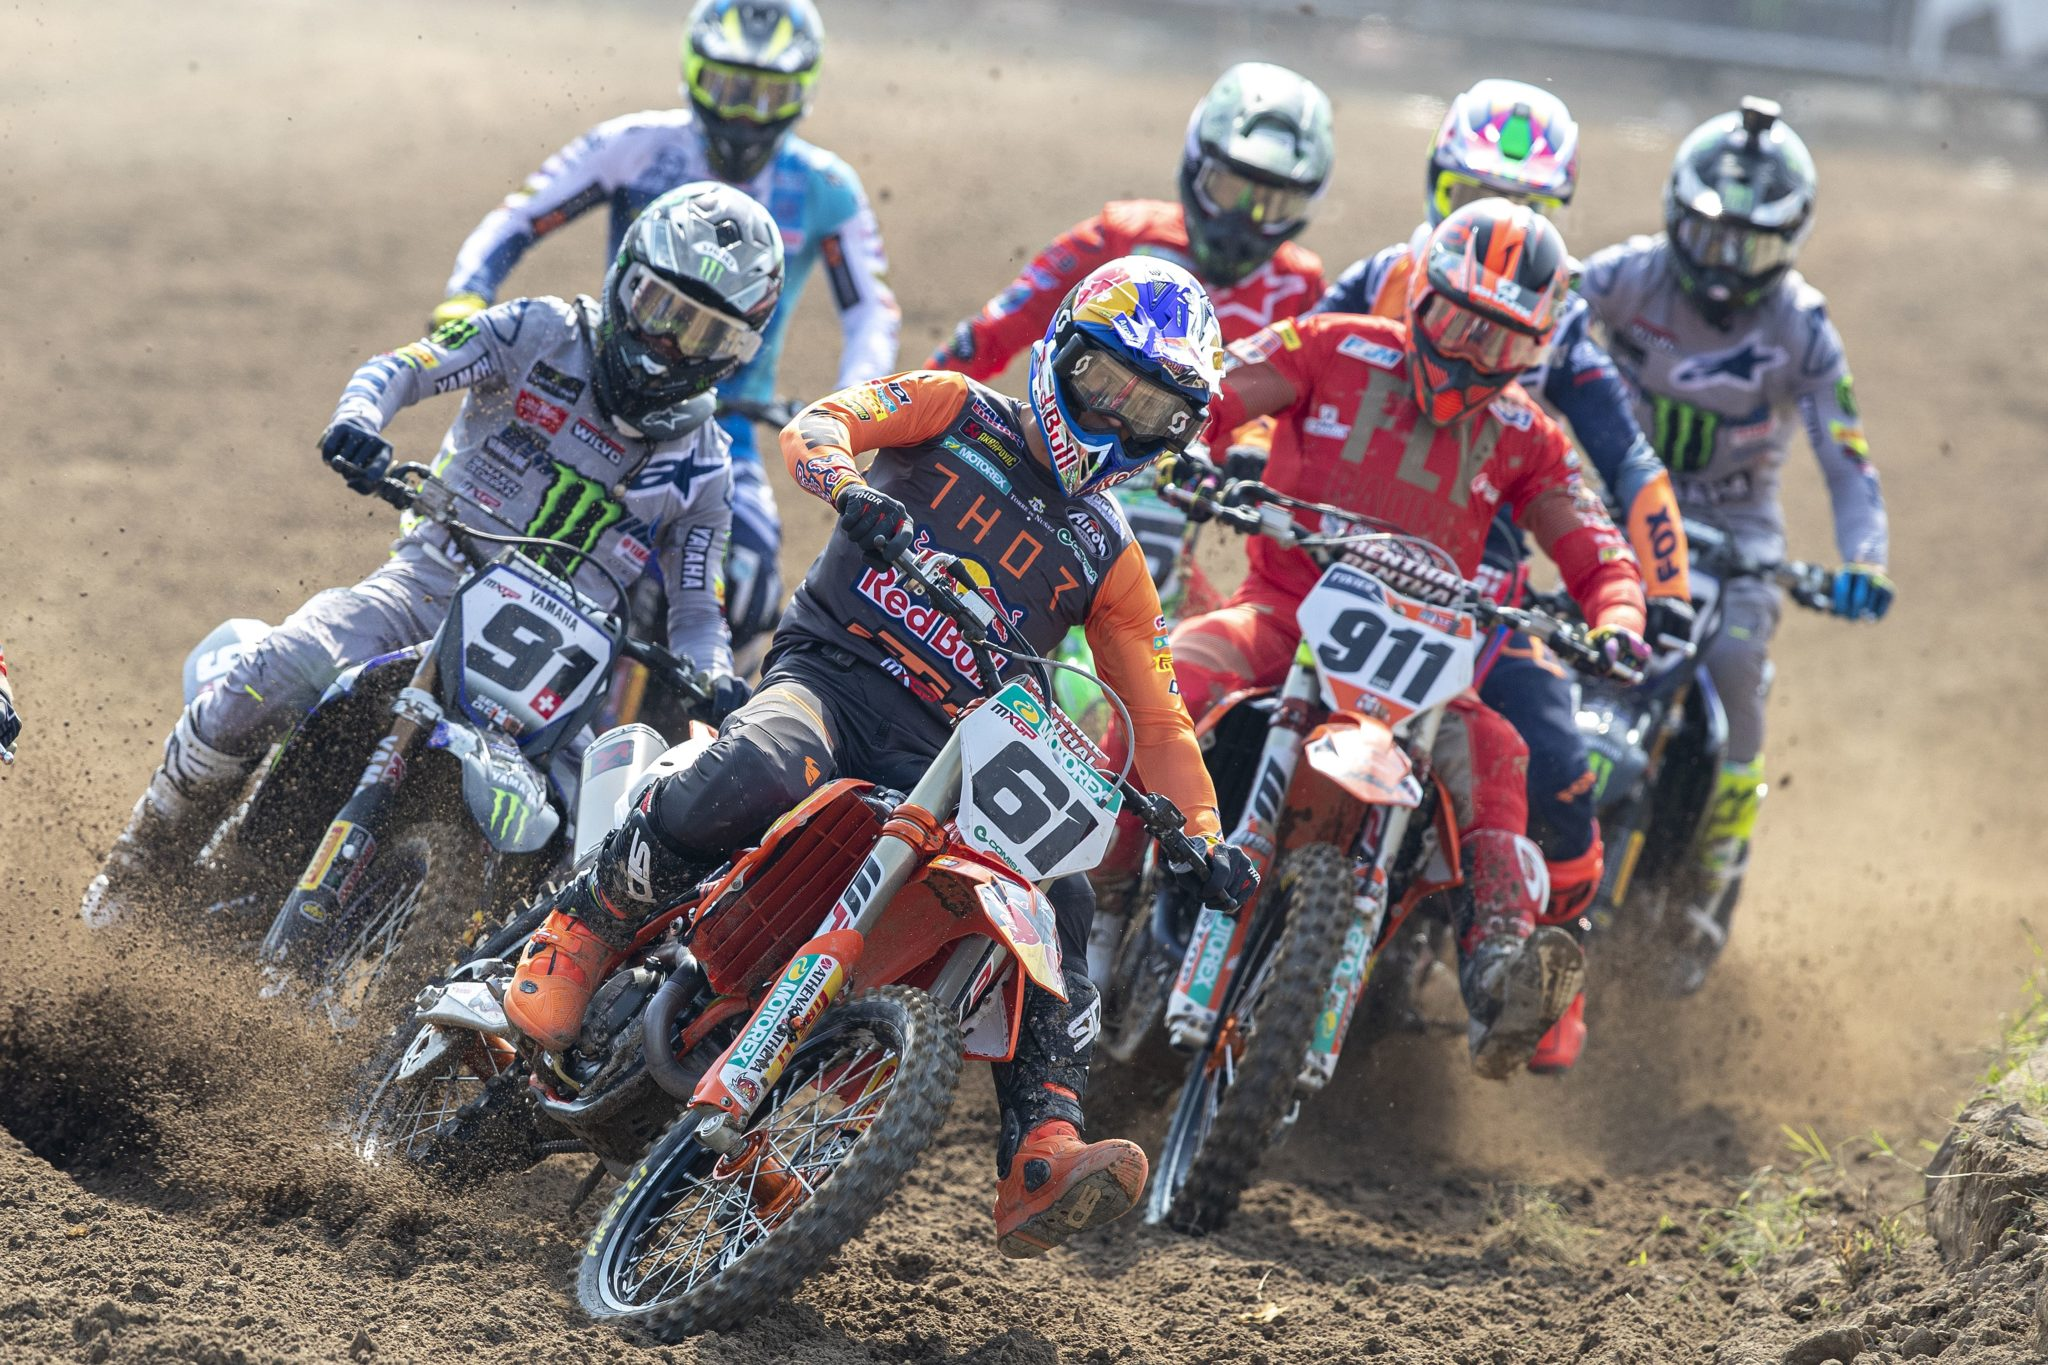 Jorge Prado scores podium win at MXGP of Citta di Mantova